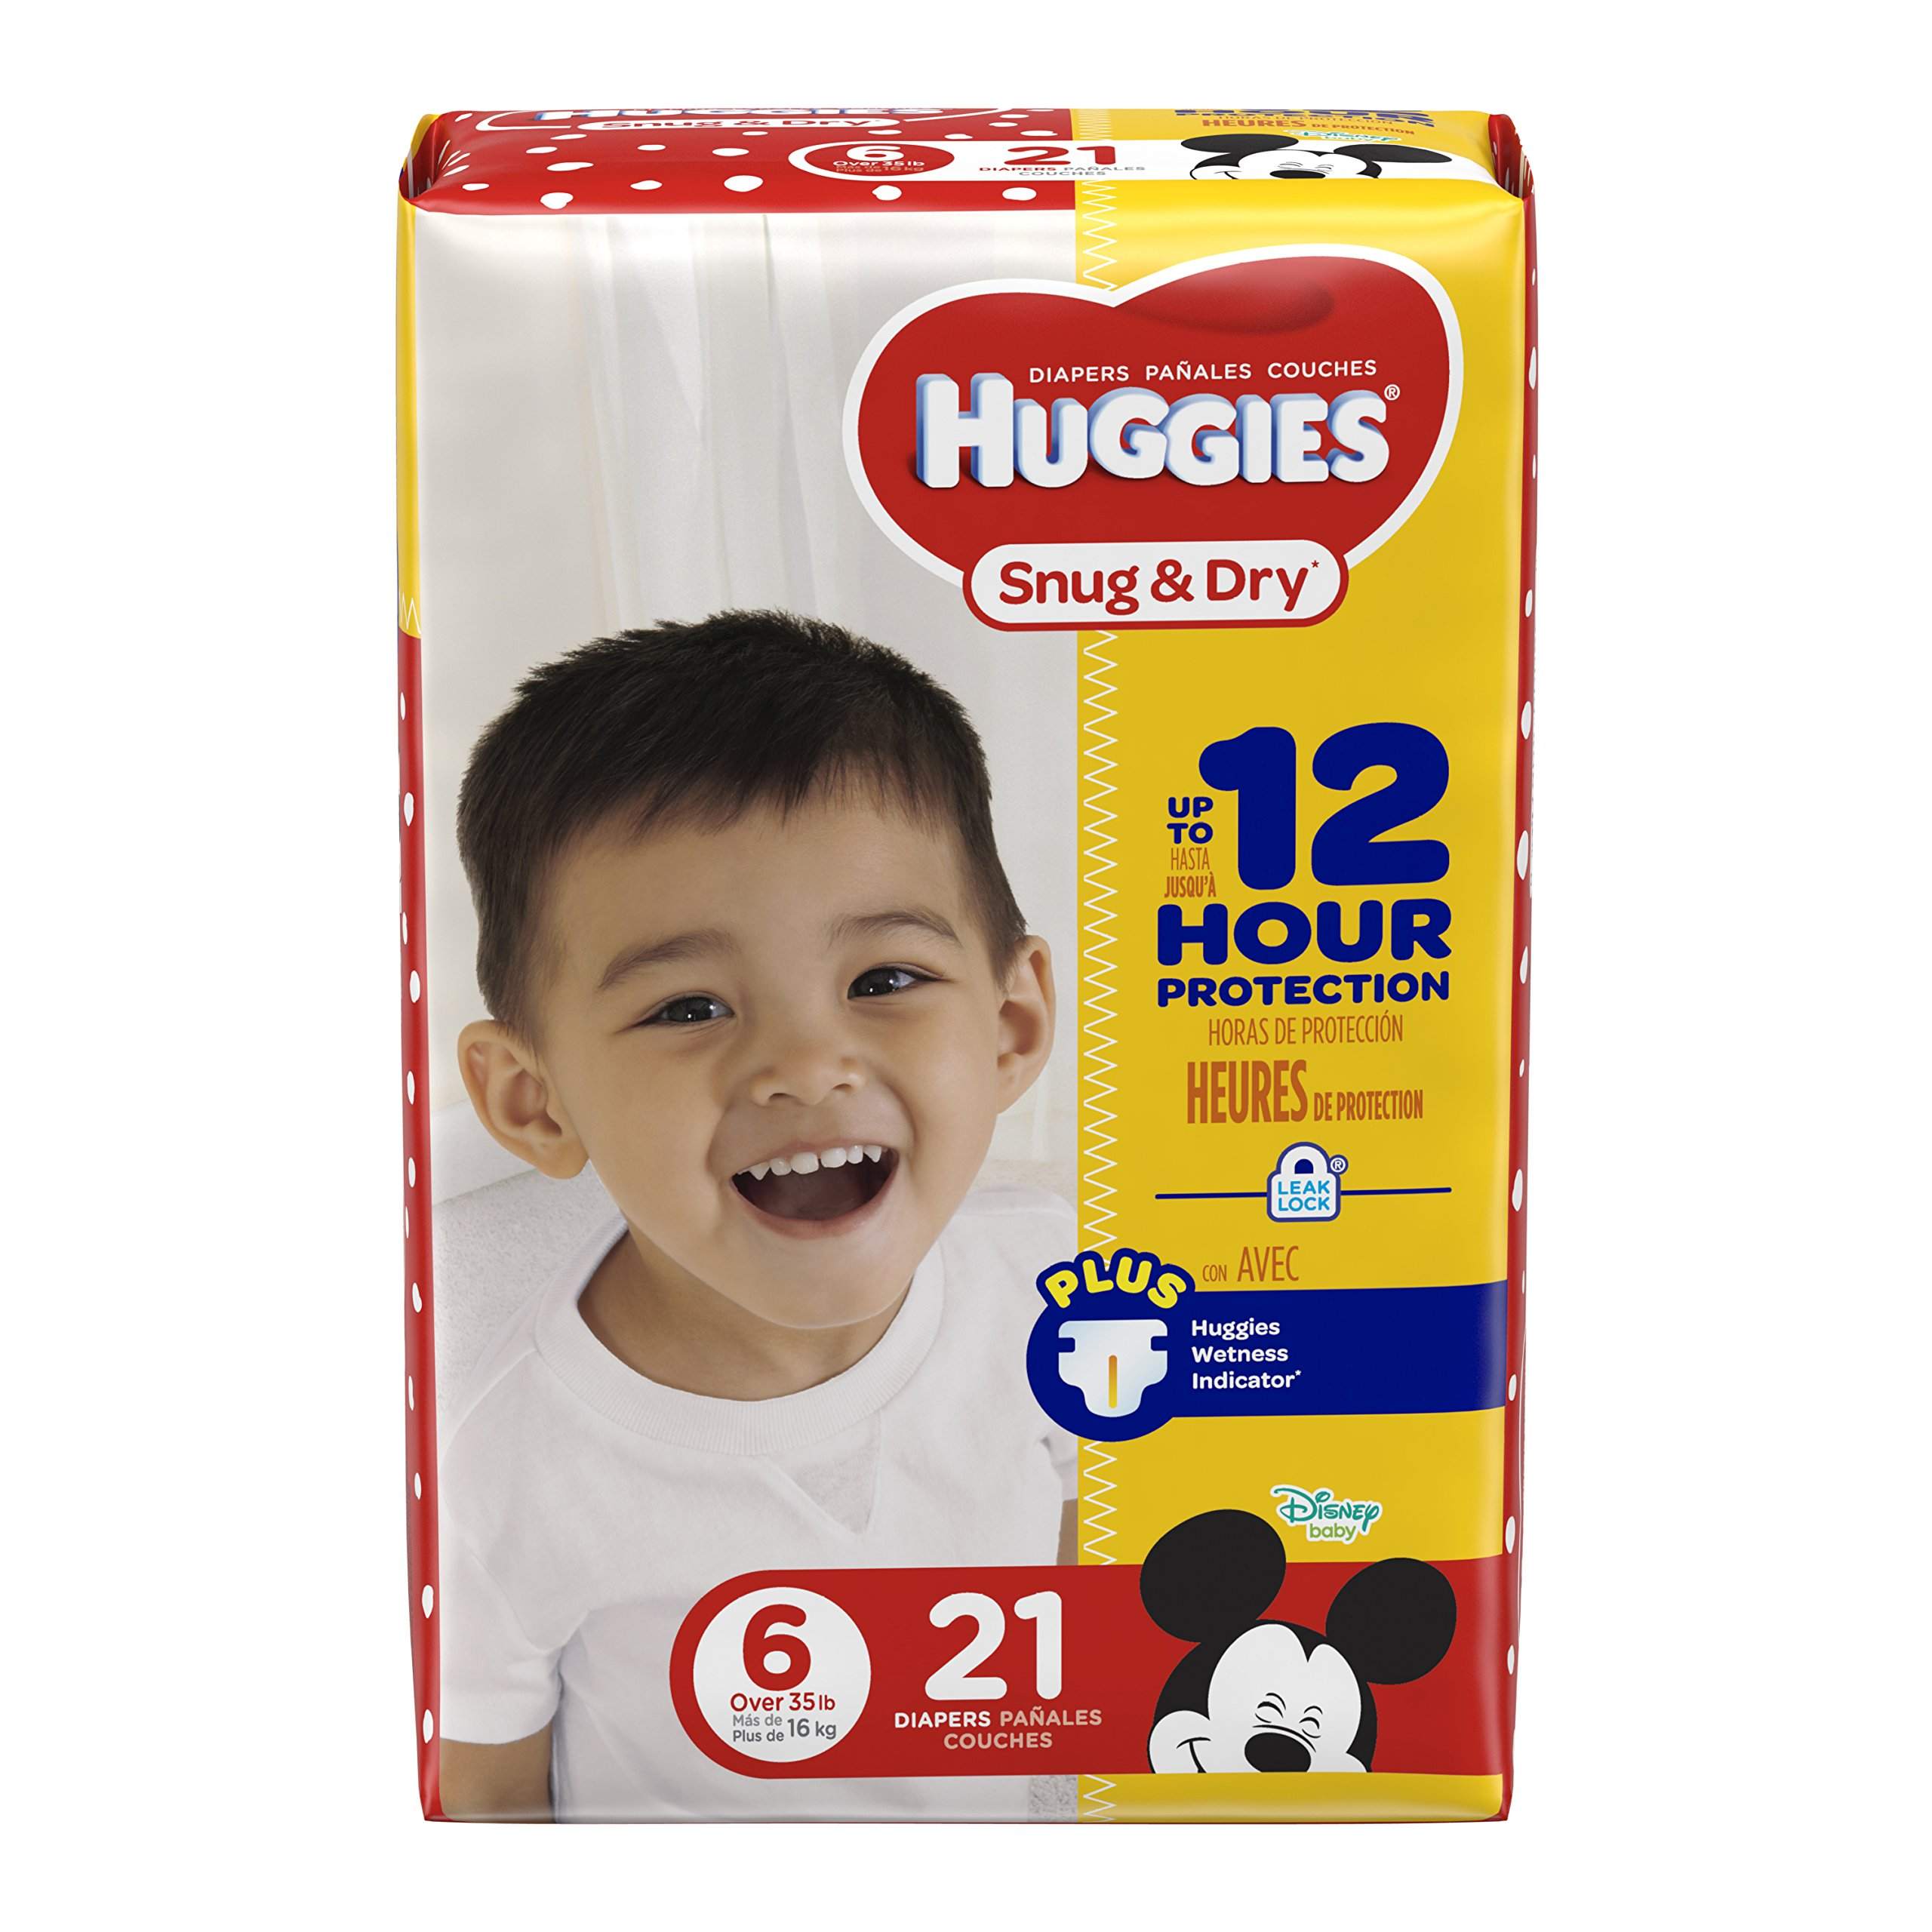 HUGGIES Snug & Dry Diapers, Size 6, 21 Count, JUMBO (Packaging May Vary)